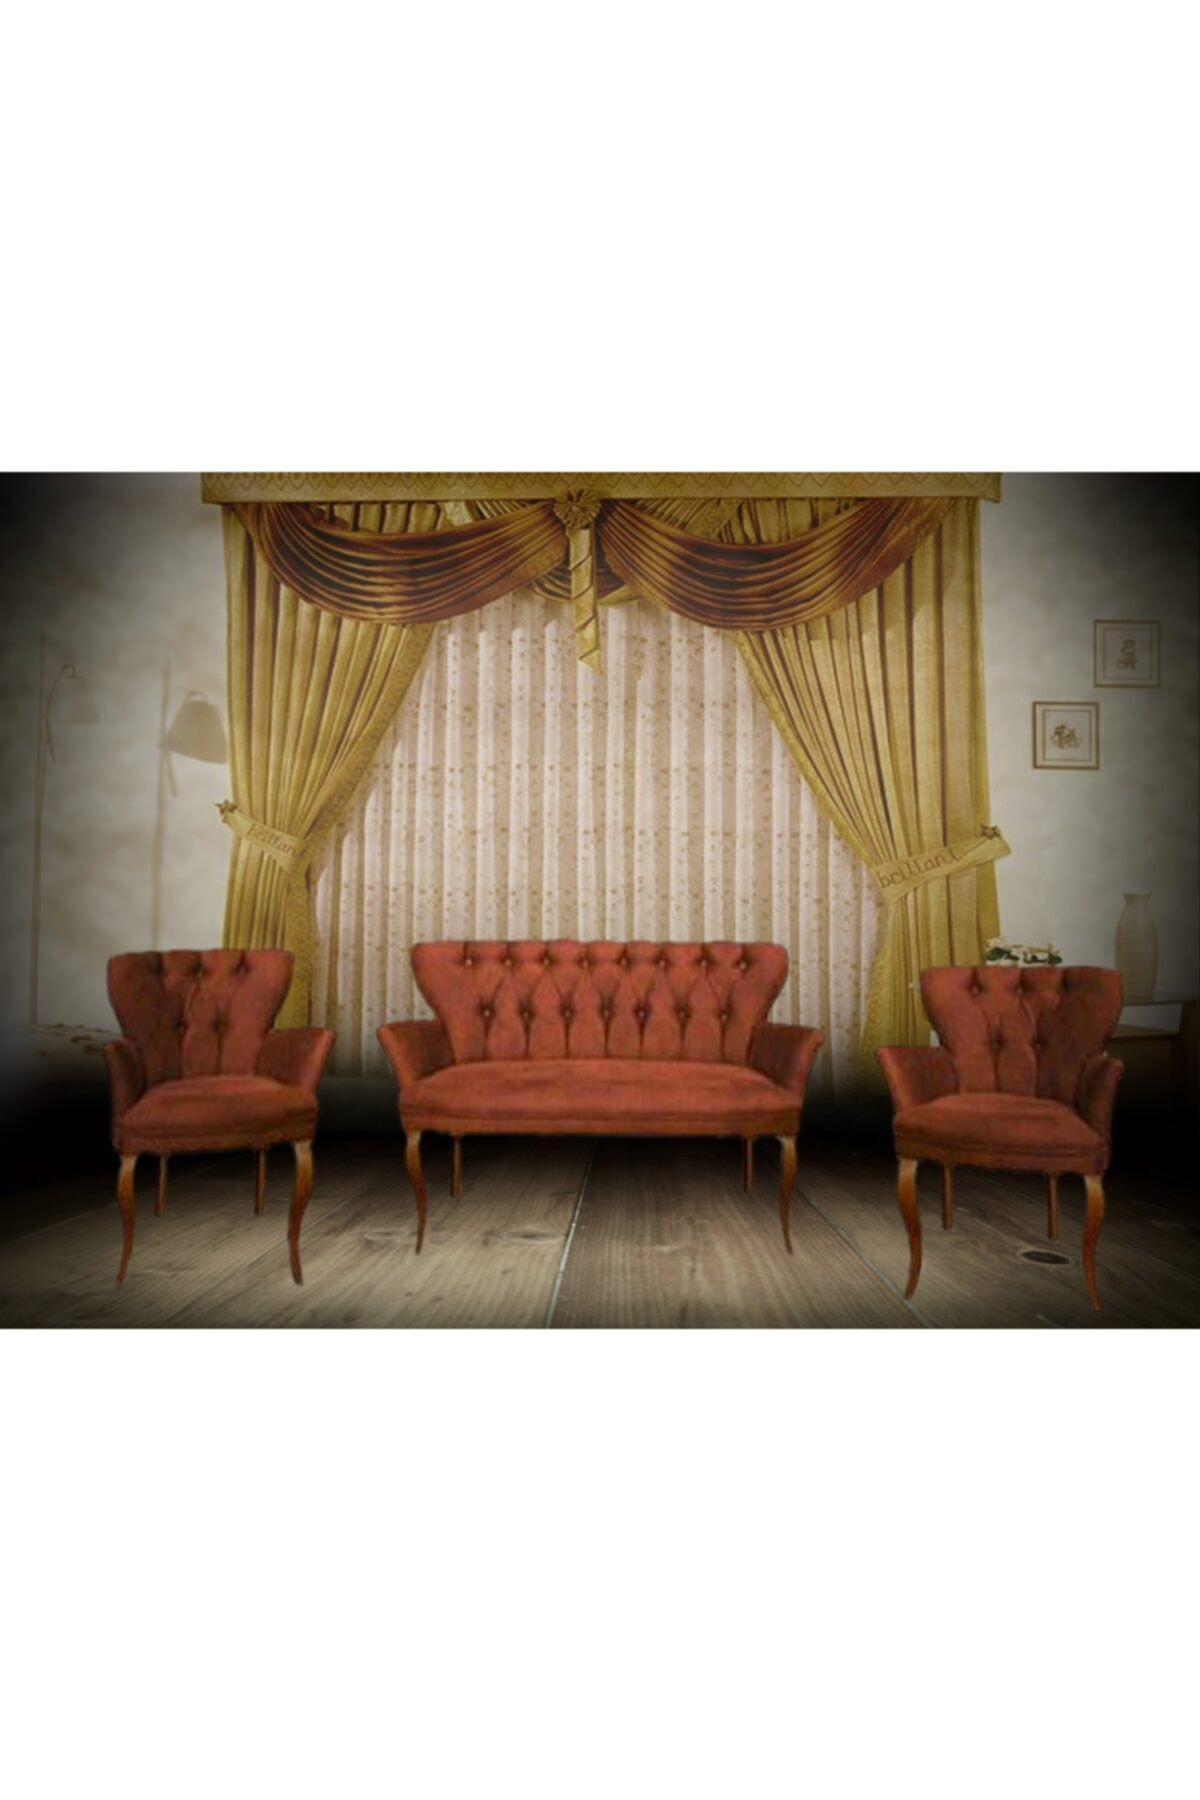 Güvensan mobilya Trendy Home Çay Seti Koltuk Takımı Kiremit Renk 2+1+1 1